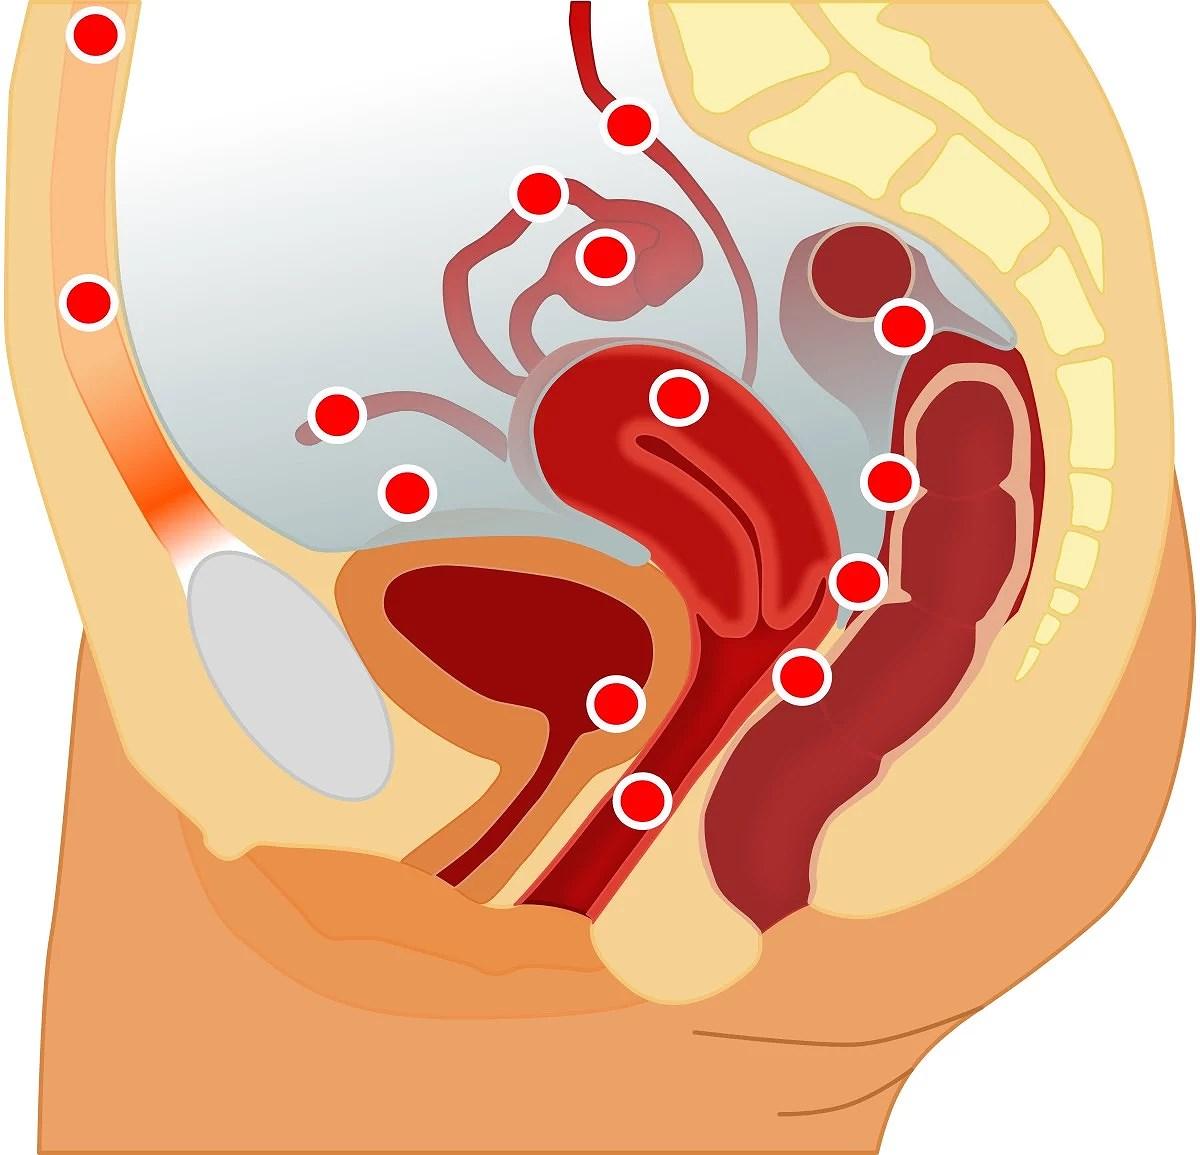 Låt oss prata om Endometrios!